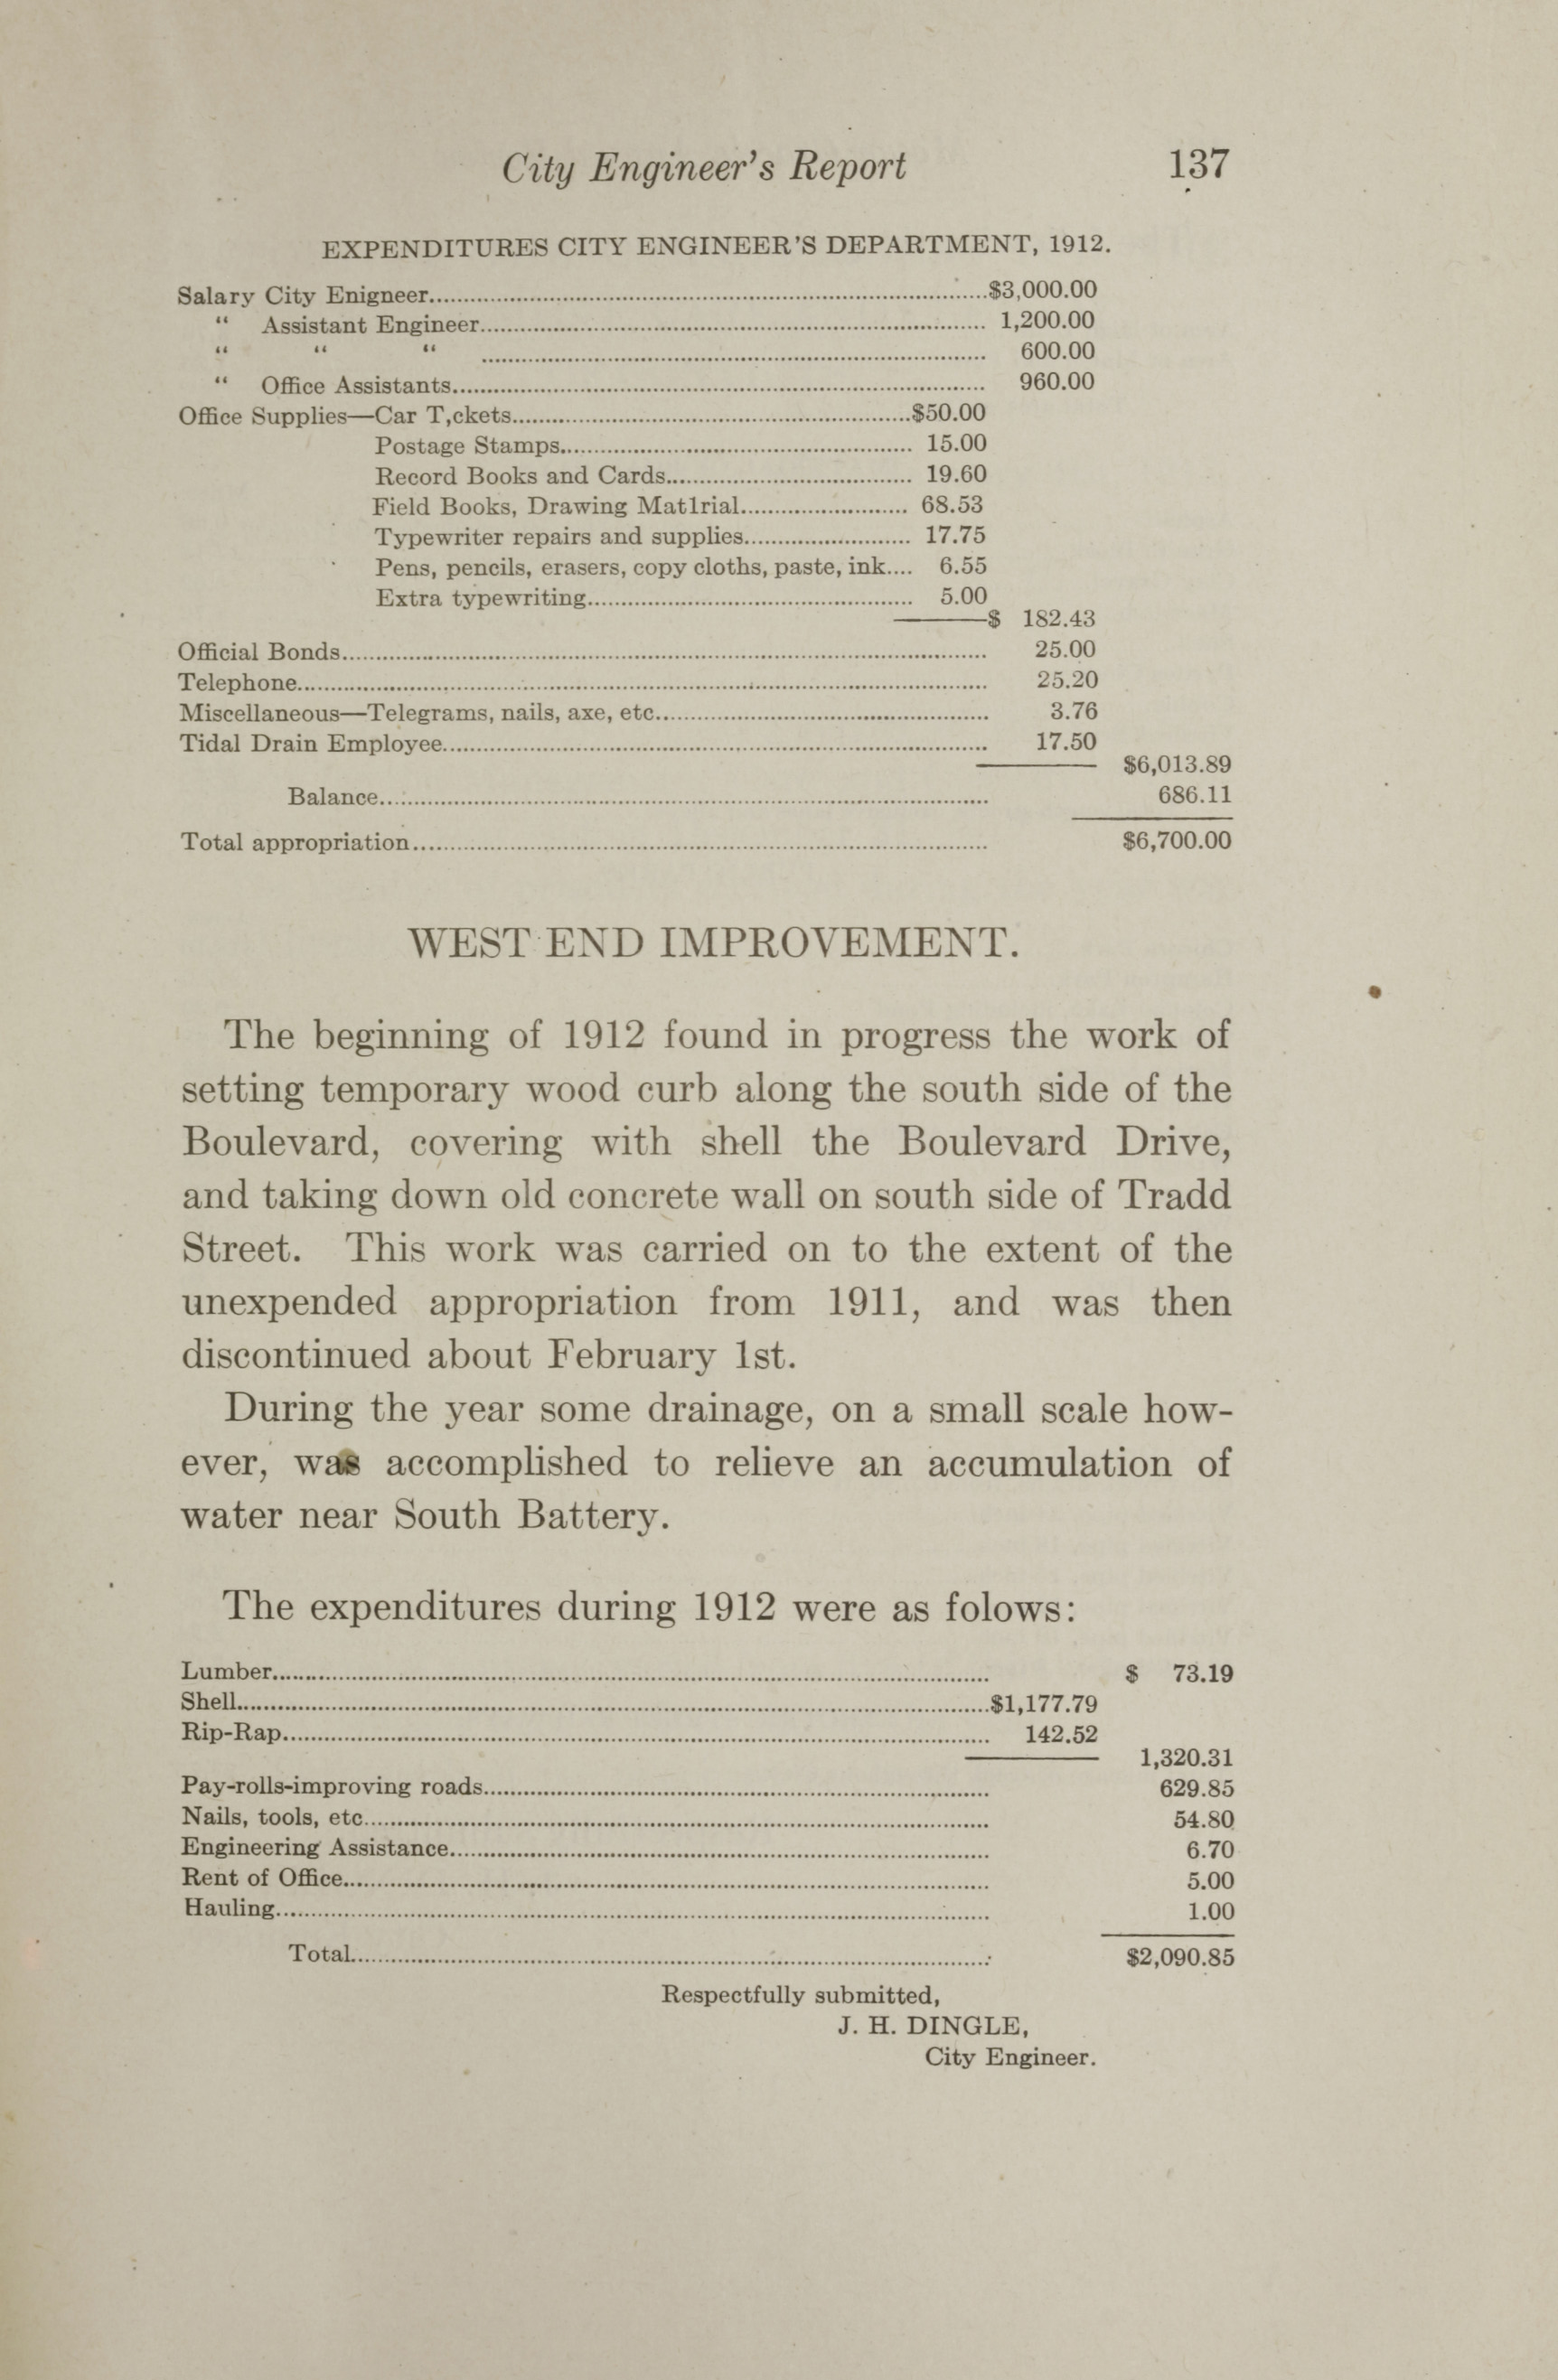 Charleston Yearbook, 1912, page 137